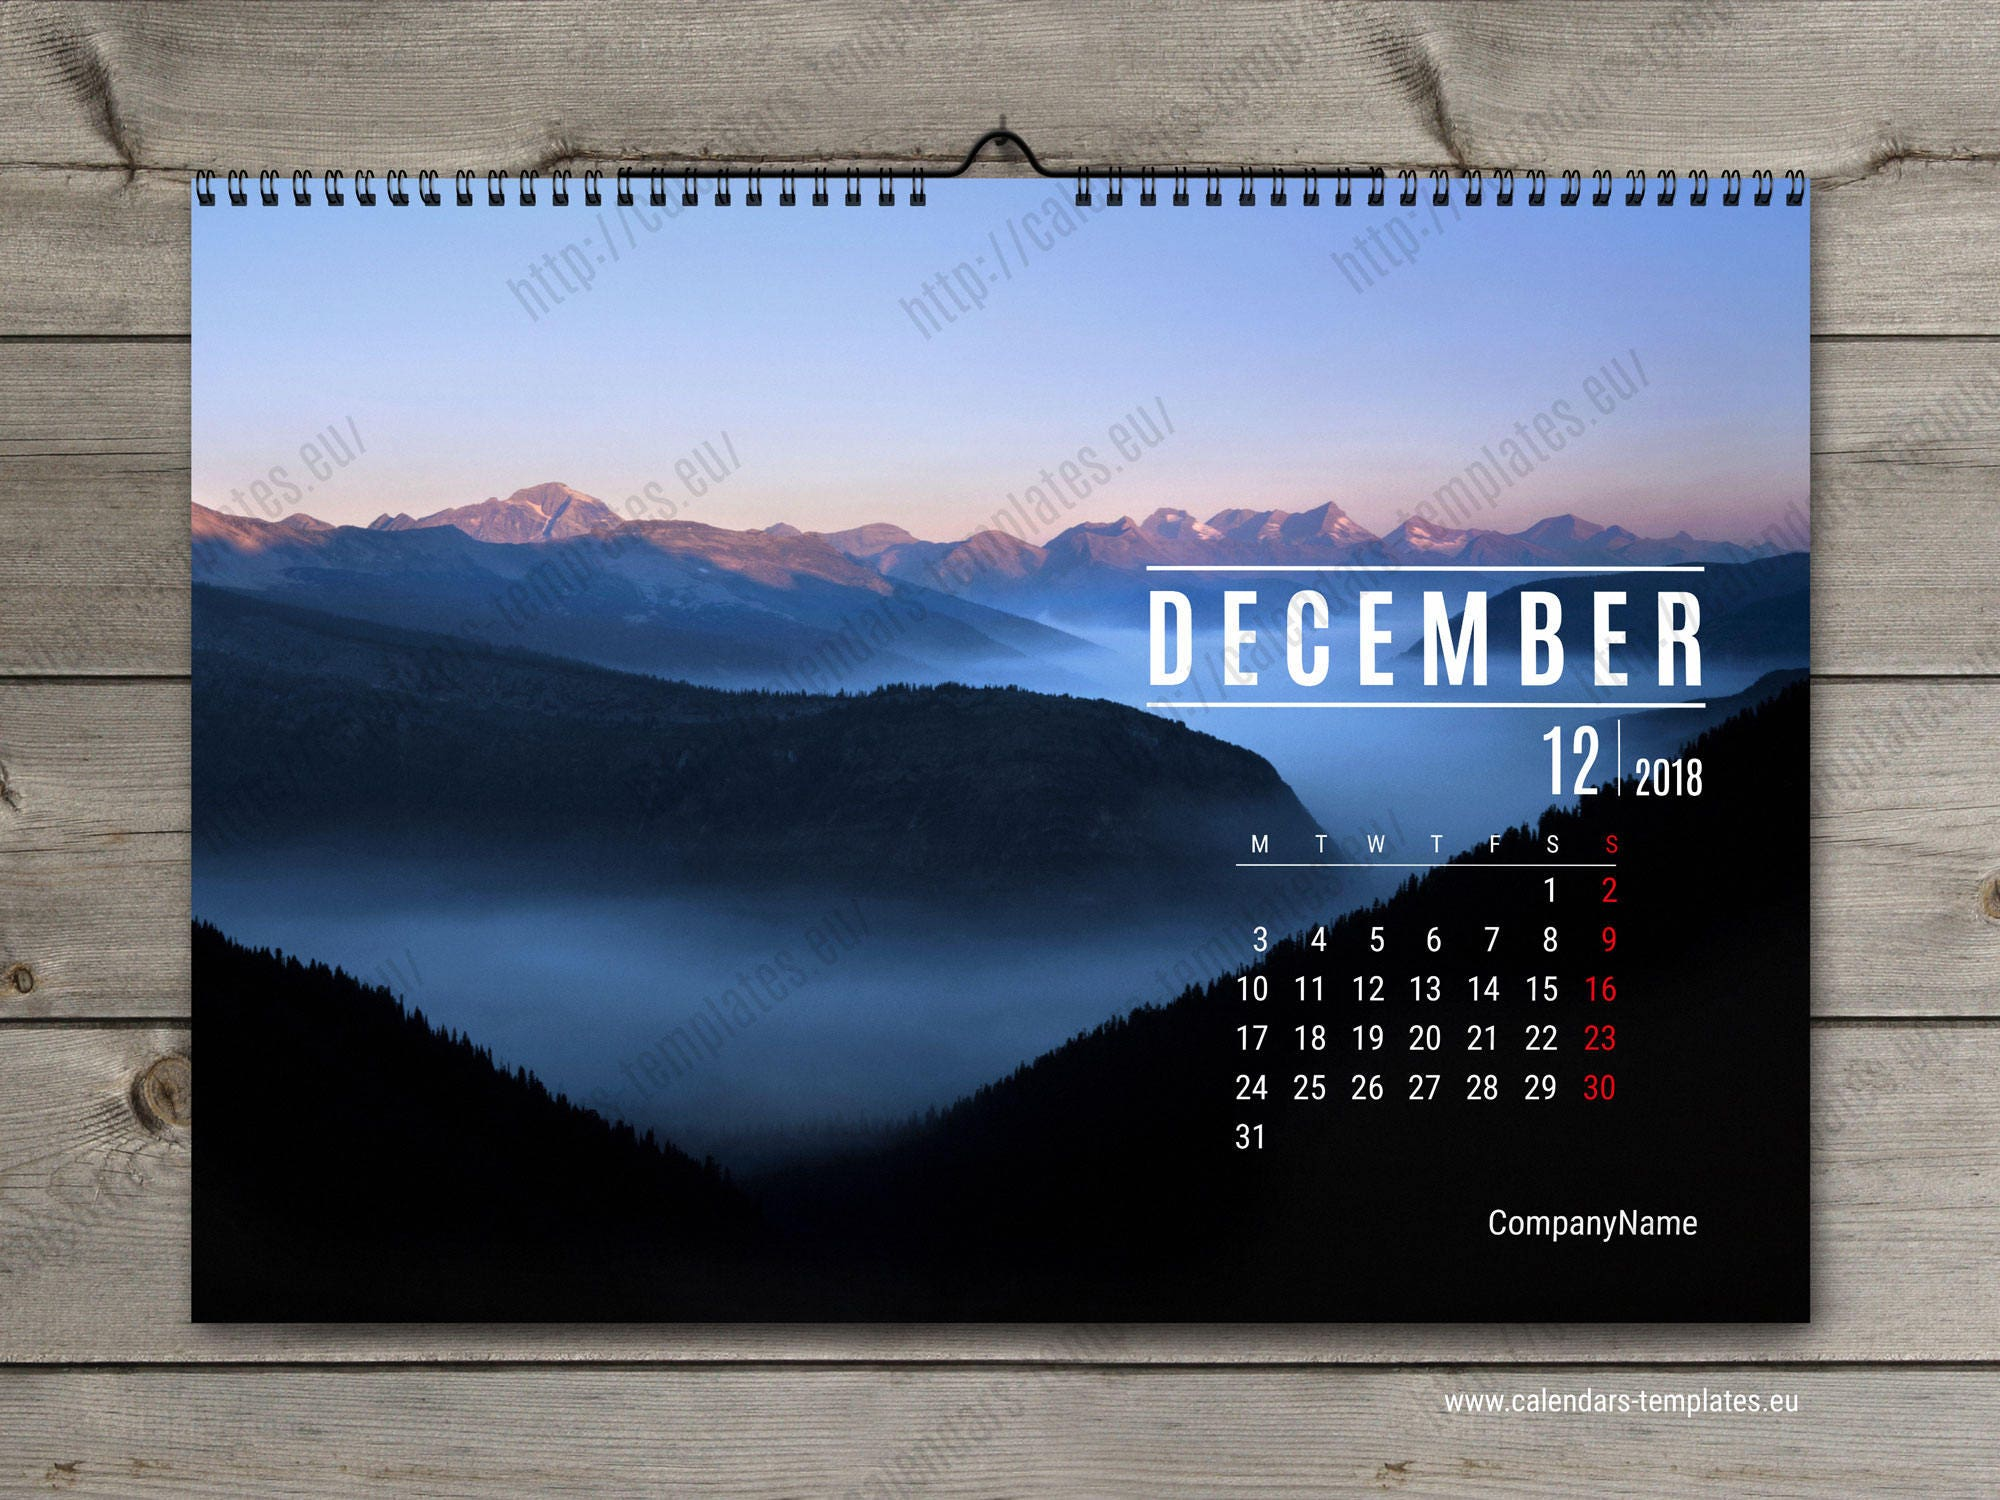 2018 horizontal wall calendar template custom photo wall. Black Bedroom Furniture Sets. Home Design Ideas